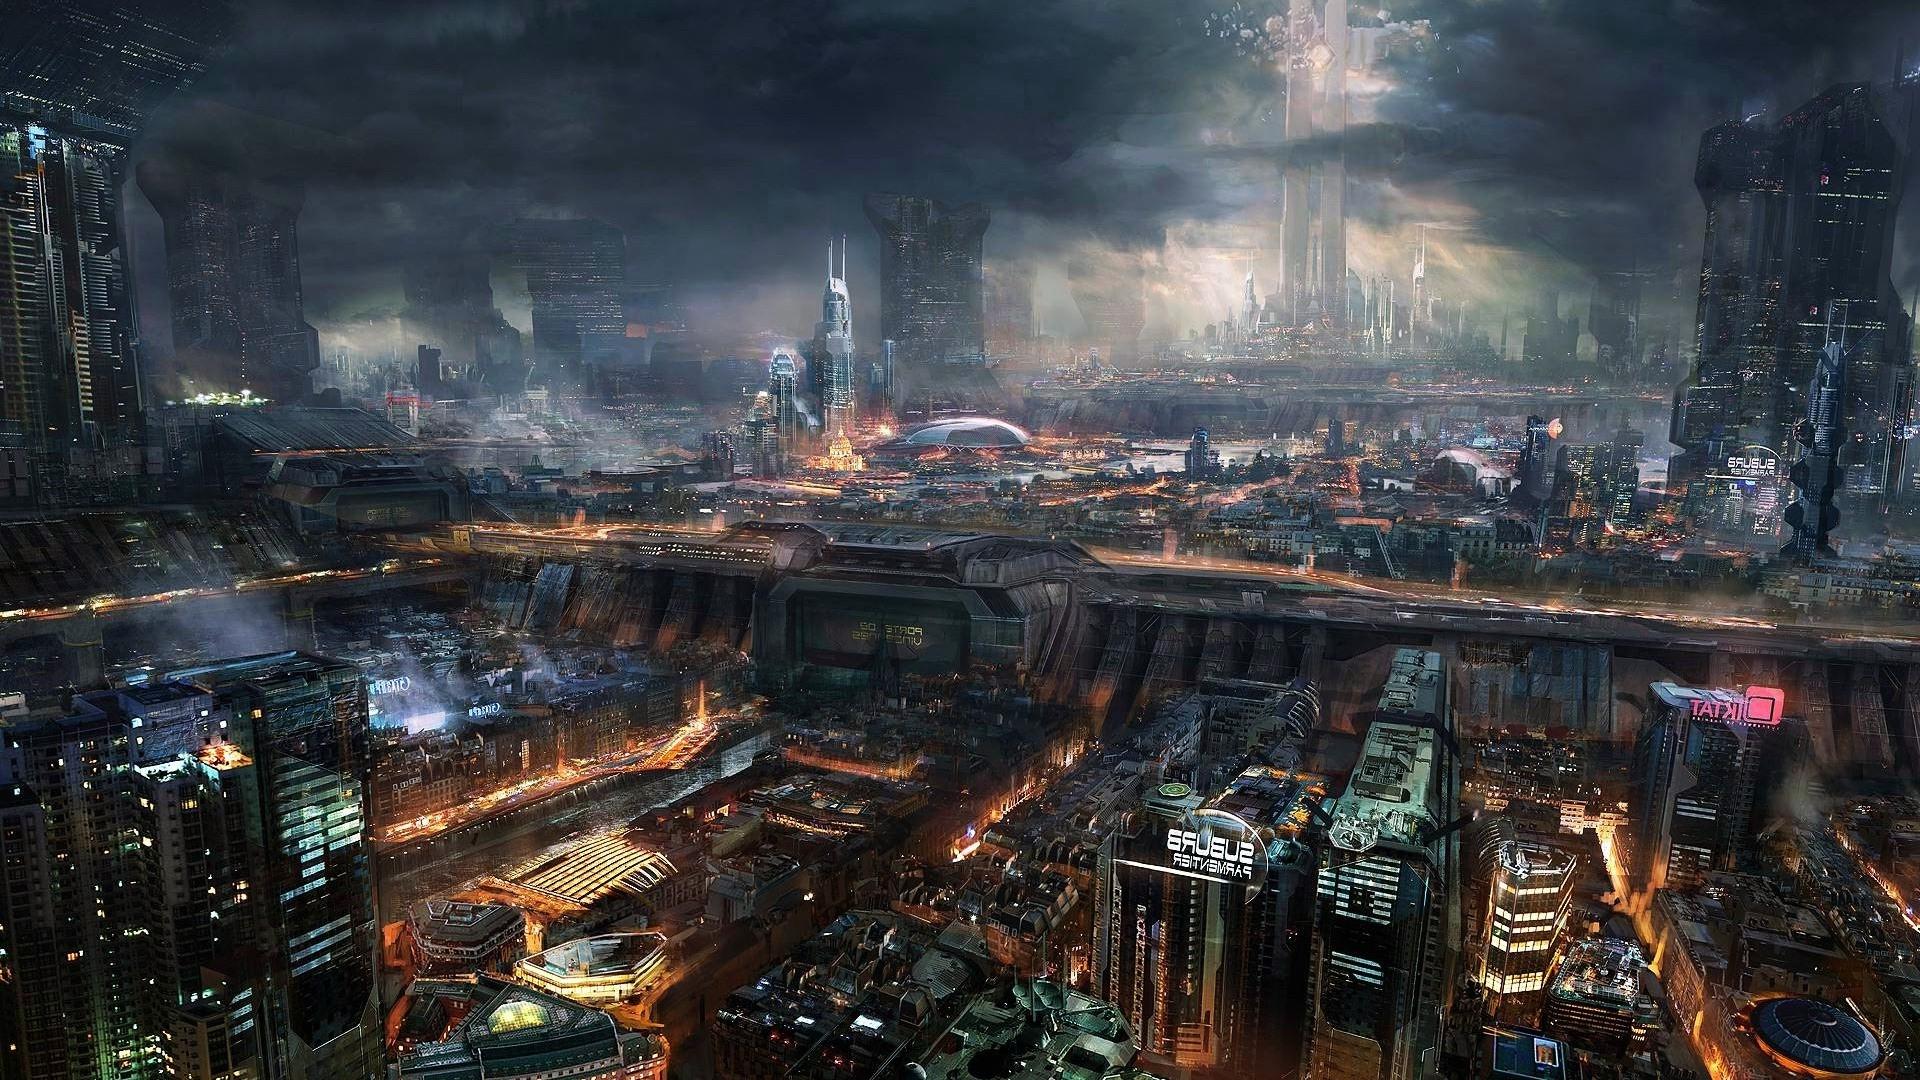 General 1920x1080 cyberpunk futuristic futuristic city cityscape